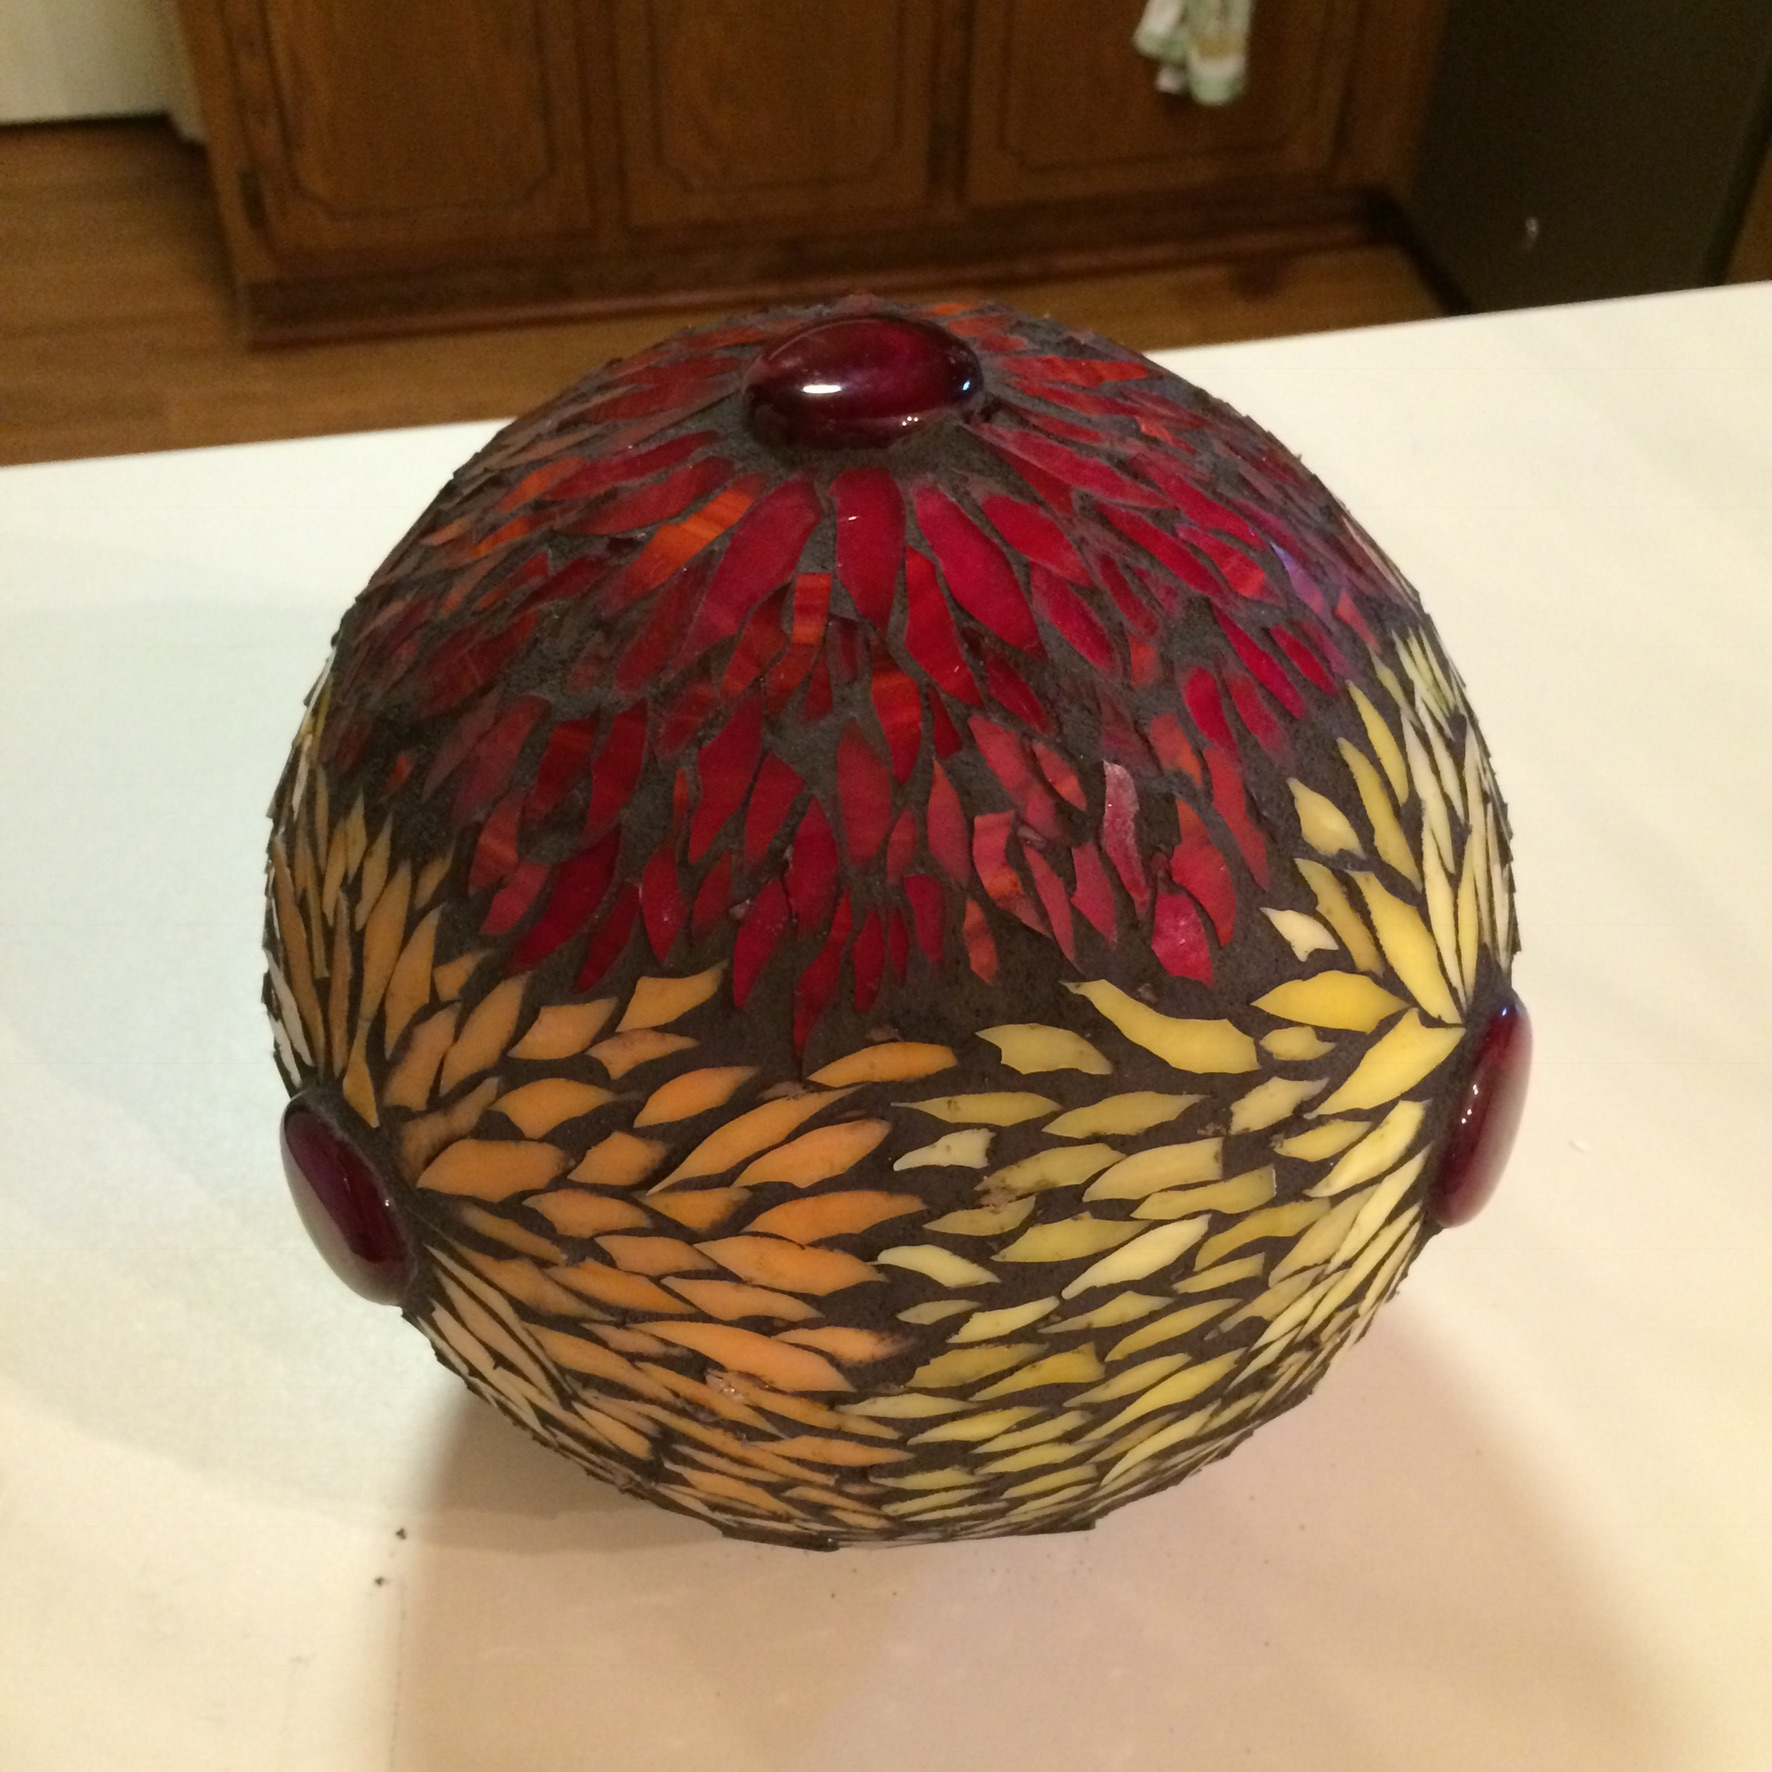 Mosaic Garden ball by Flower Floozy Designs